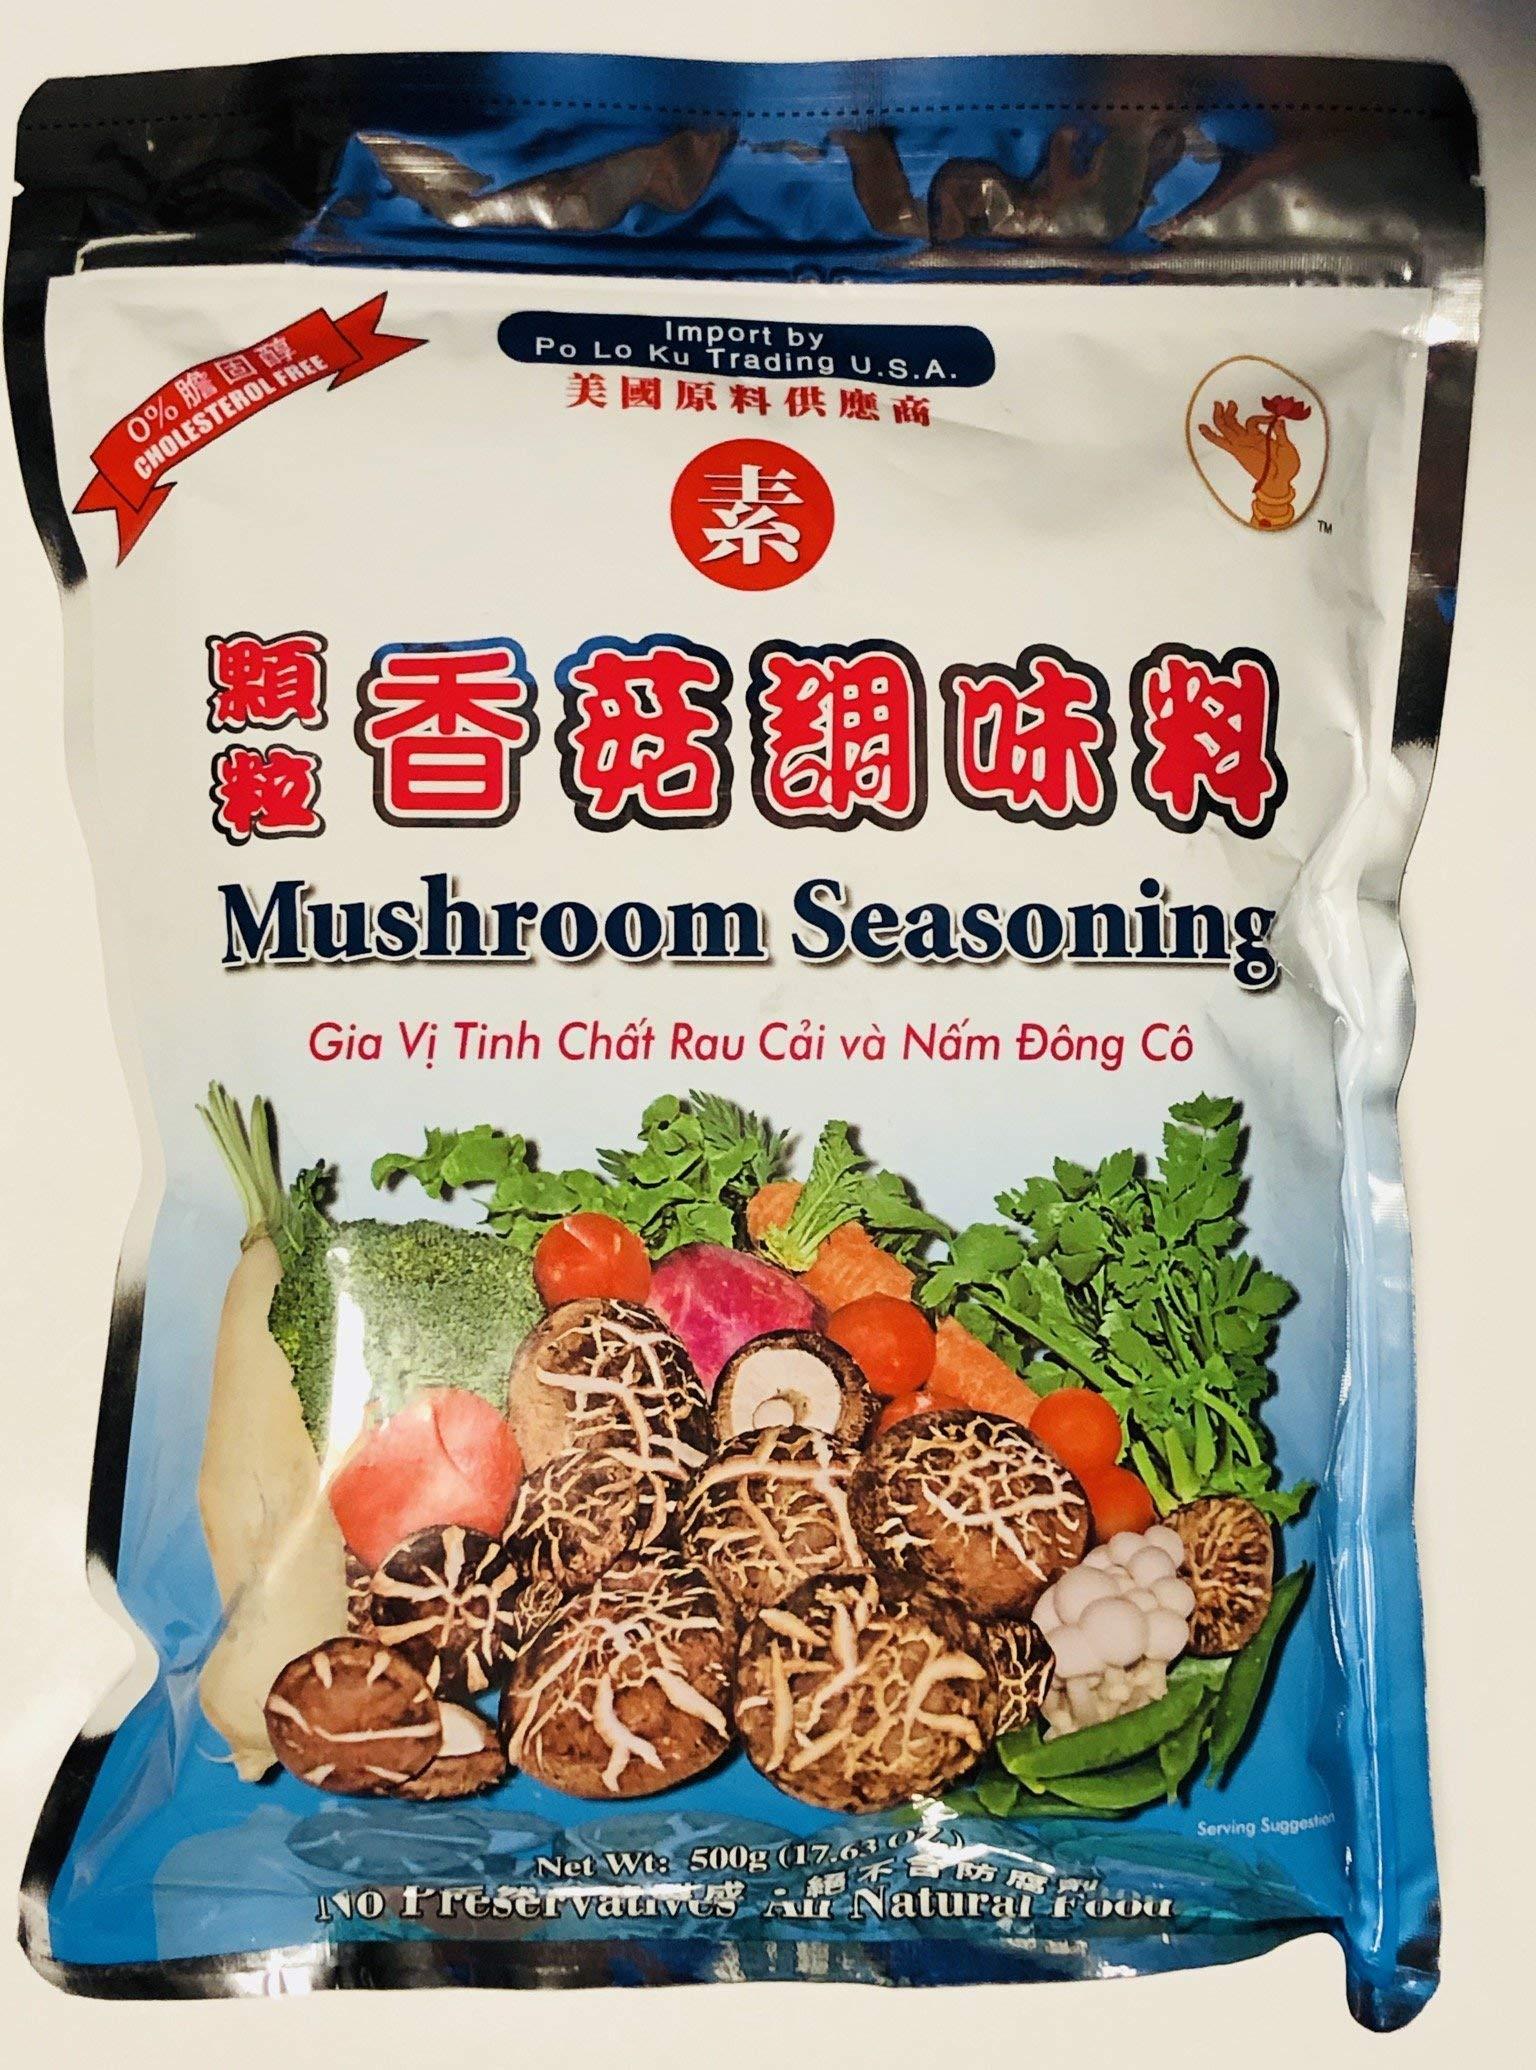 Po Lo Ku All Natural Mushroom Seasoning (17.11oz)